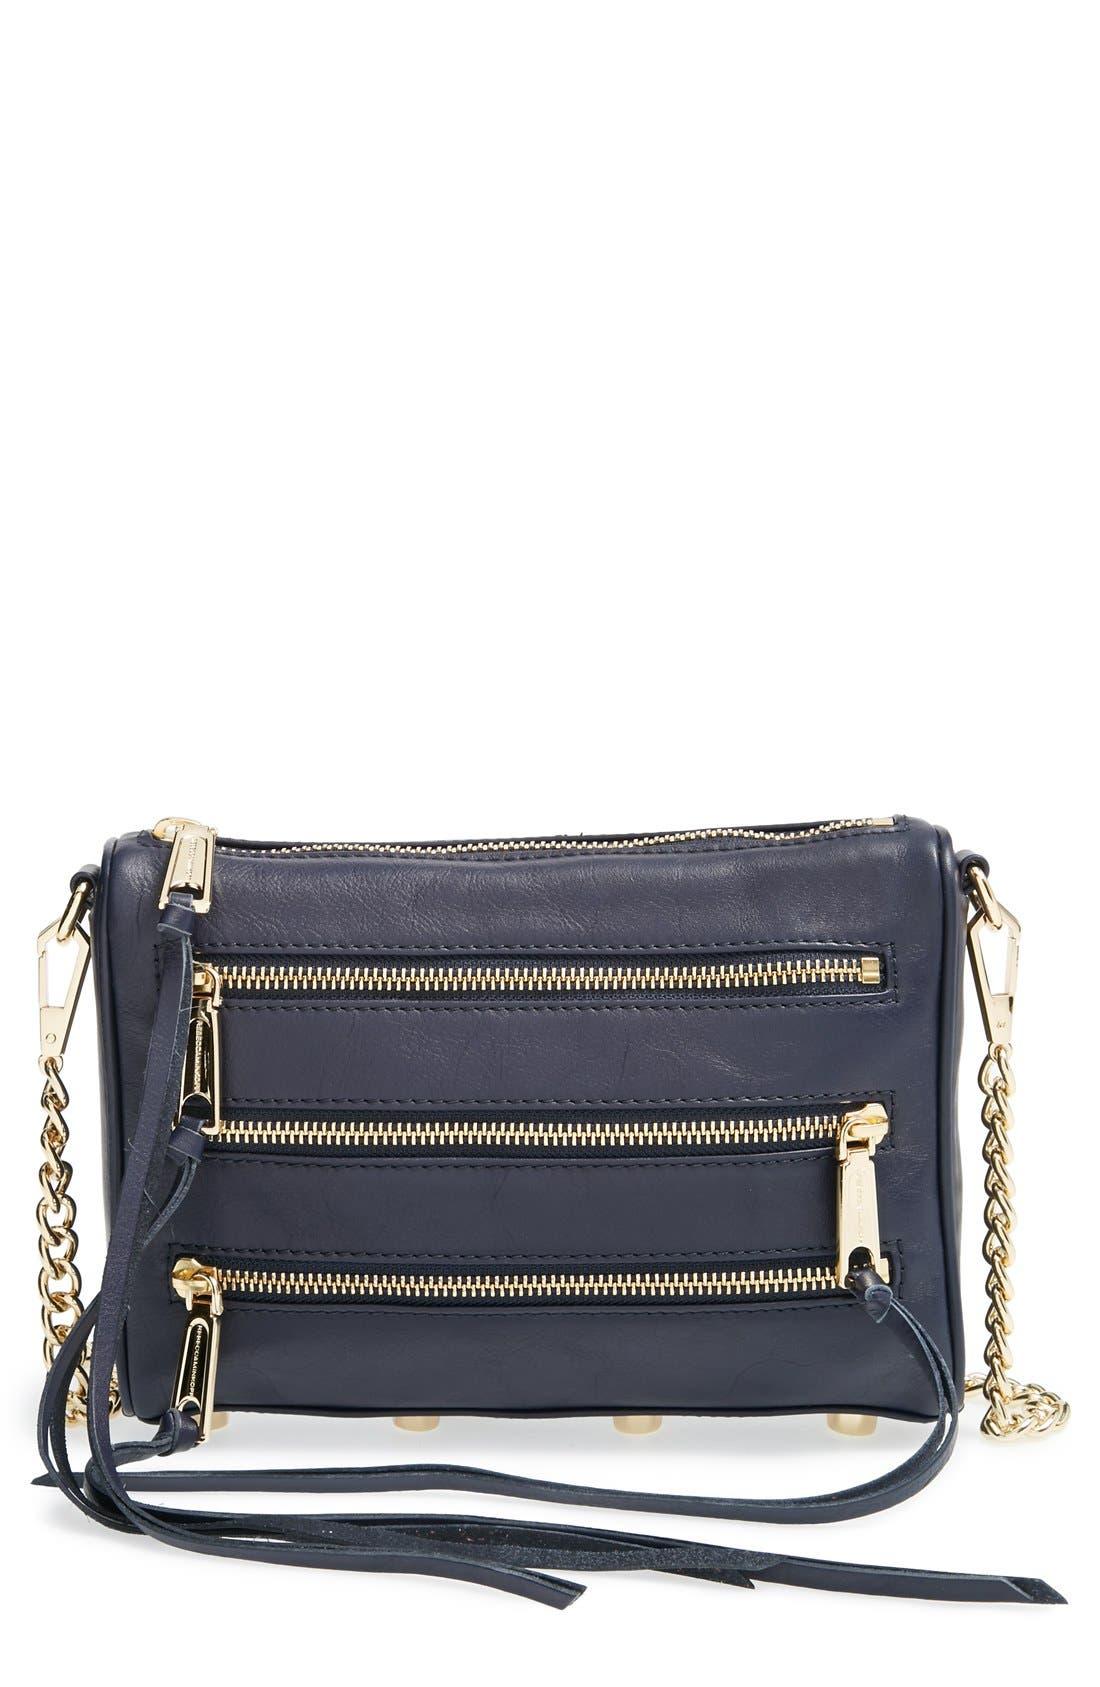 Alternate Image 1 Selected - Rebecca Minkoff 'Mini 5-Zip' Convertible Crossbody Bag